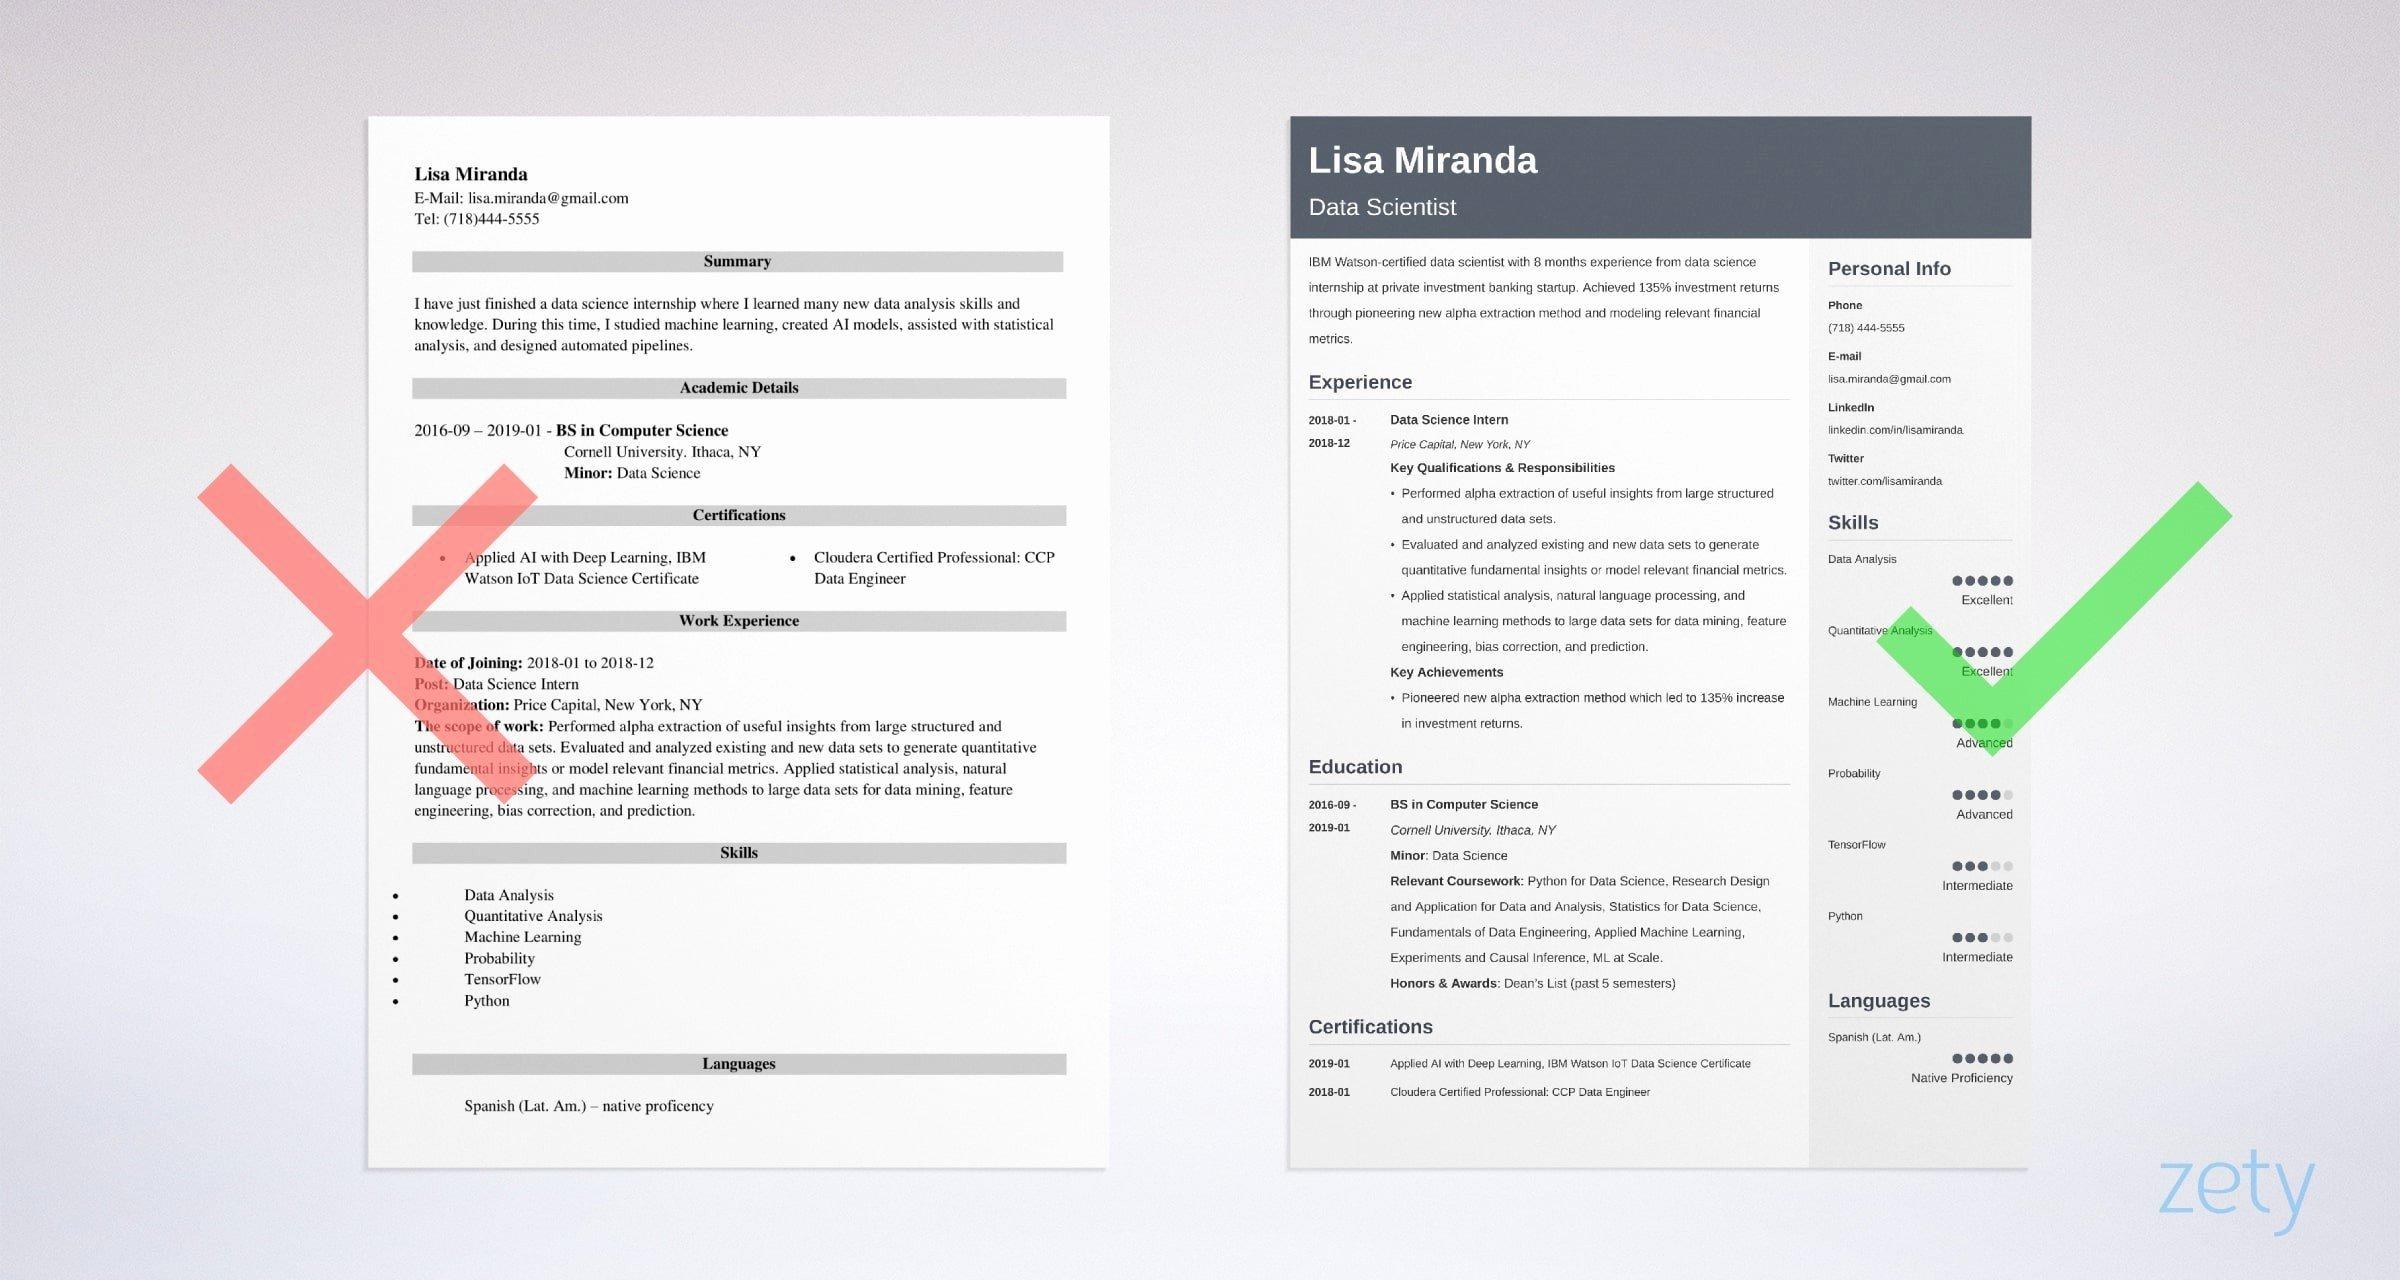 College Graduate Resume Template Inspirational Recent College Graduate Resume Sample & Full Guide [20